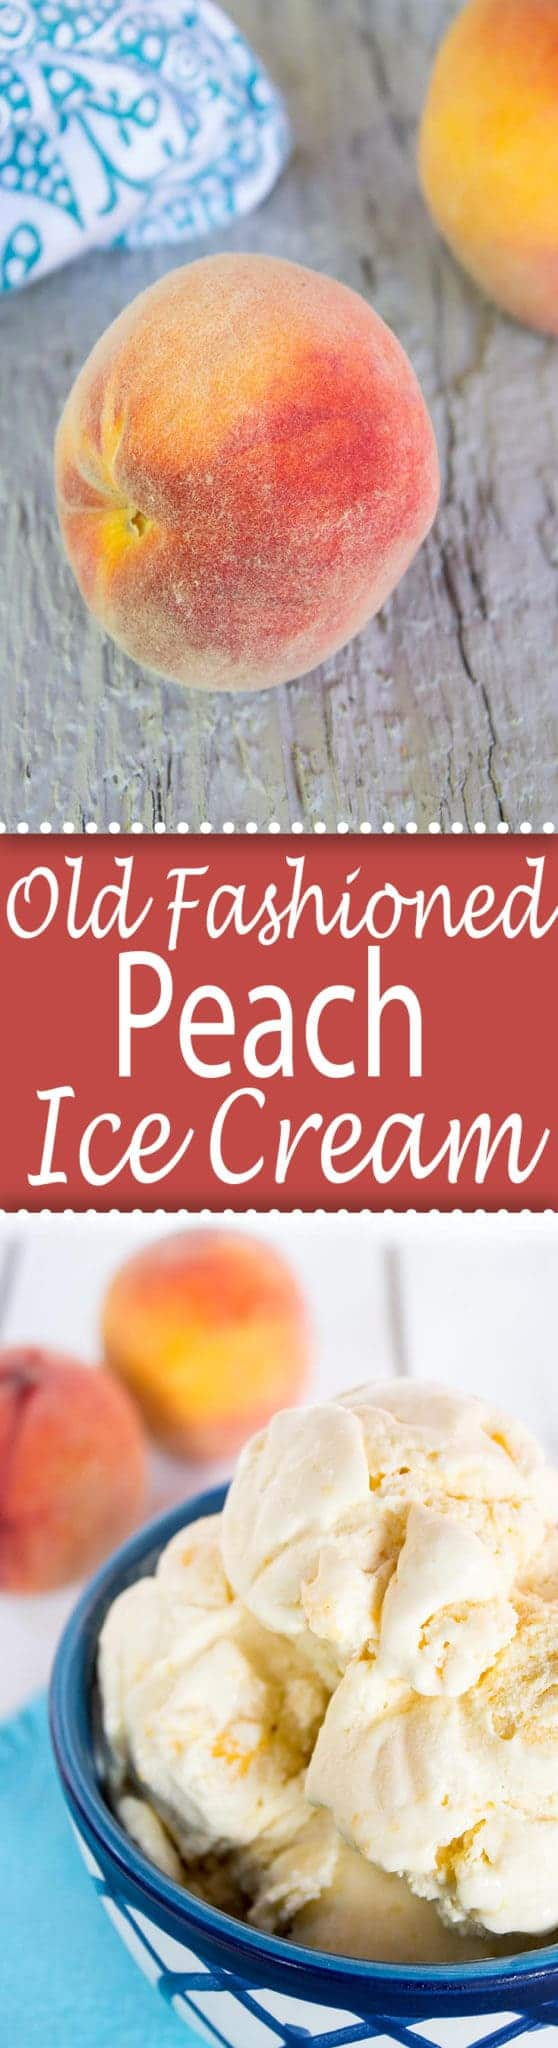 Old Fashioned Peach Ice Cream beyondthechickencoop.com